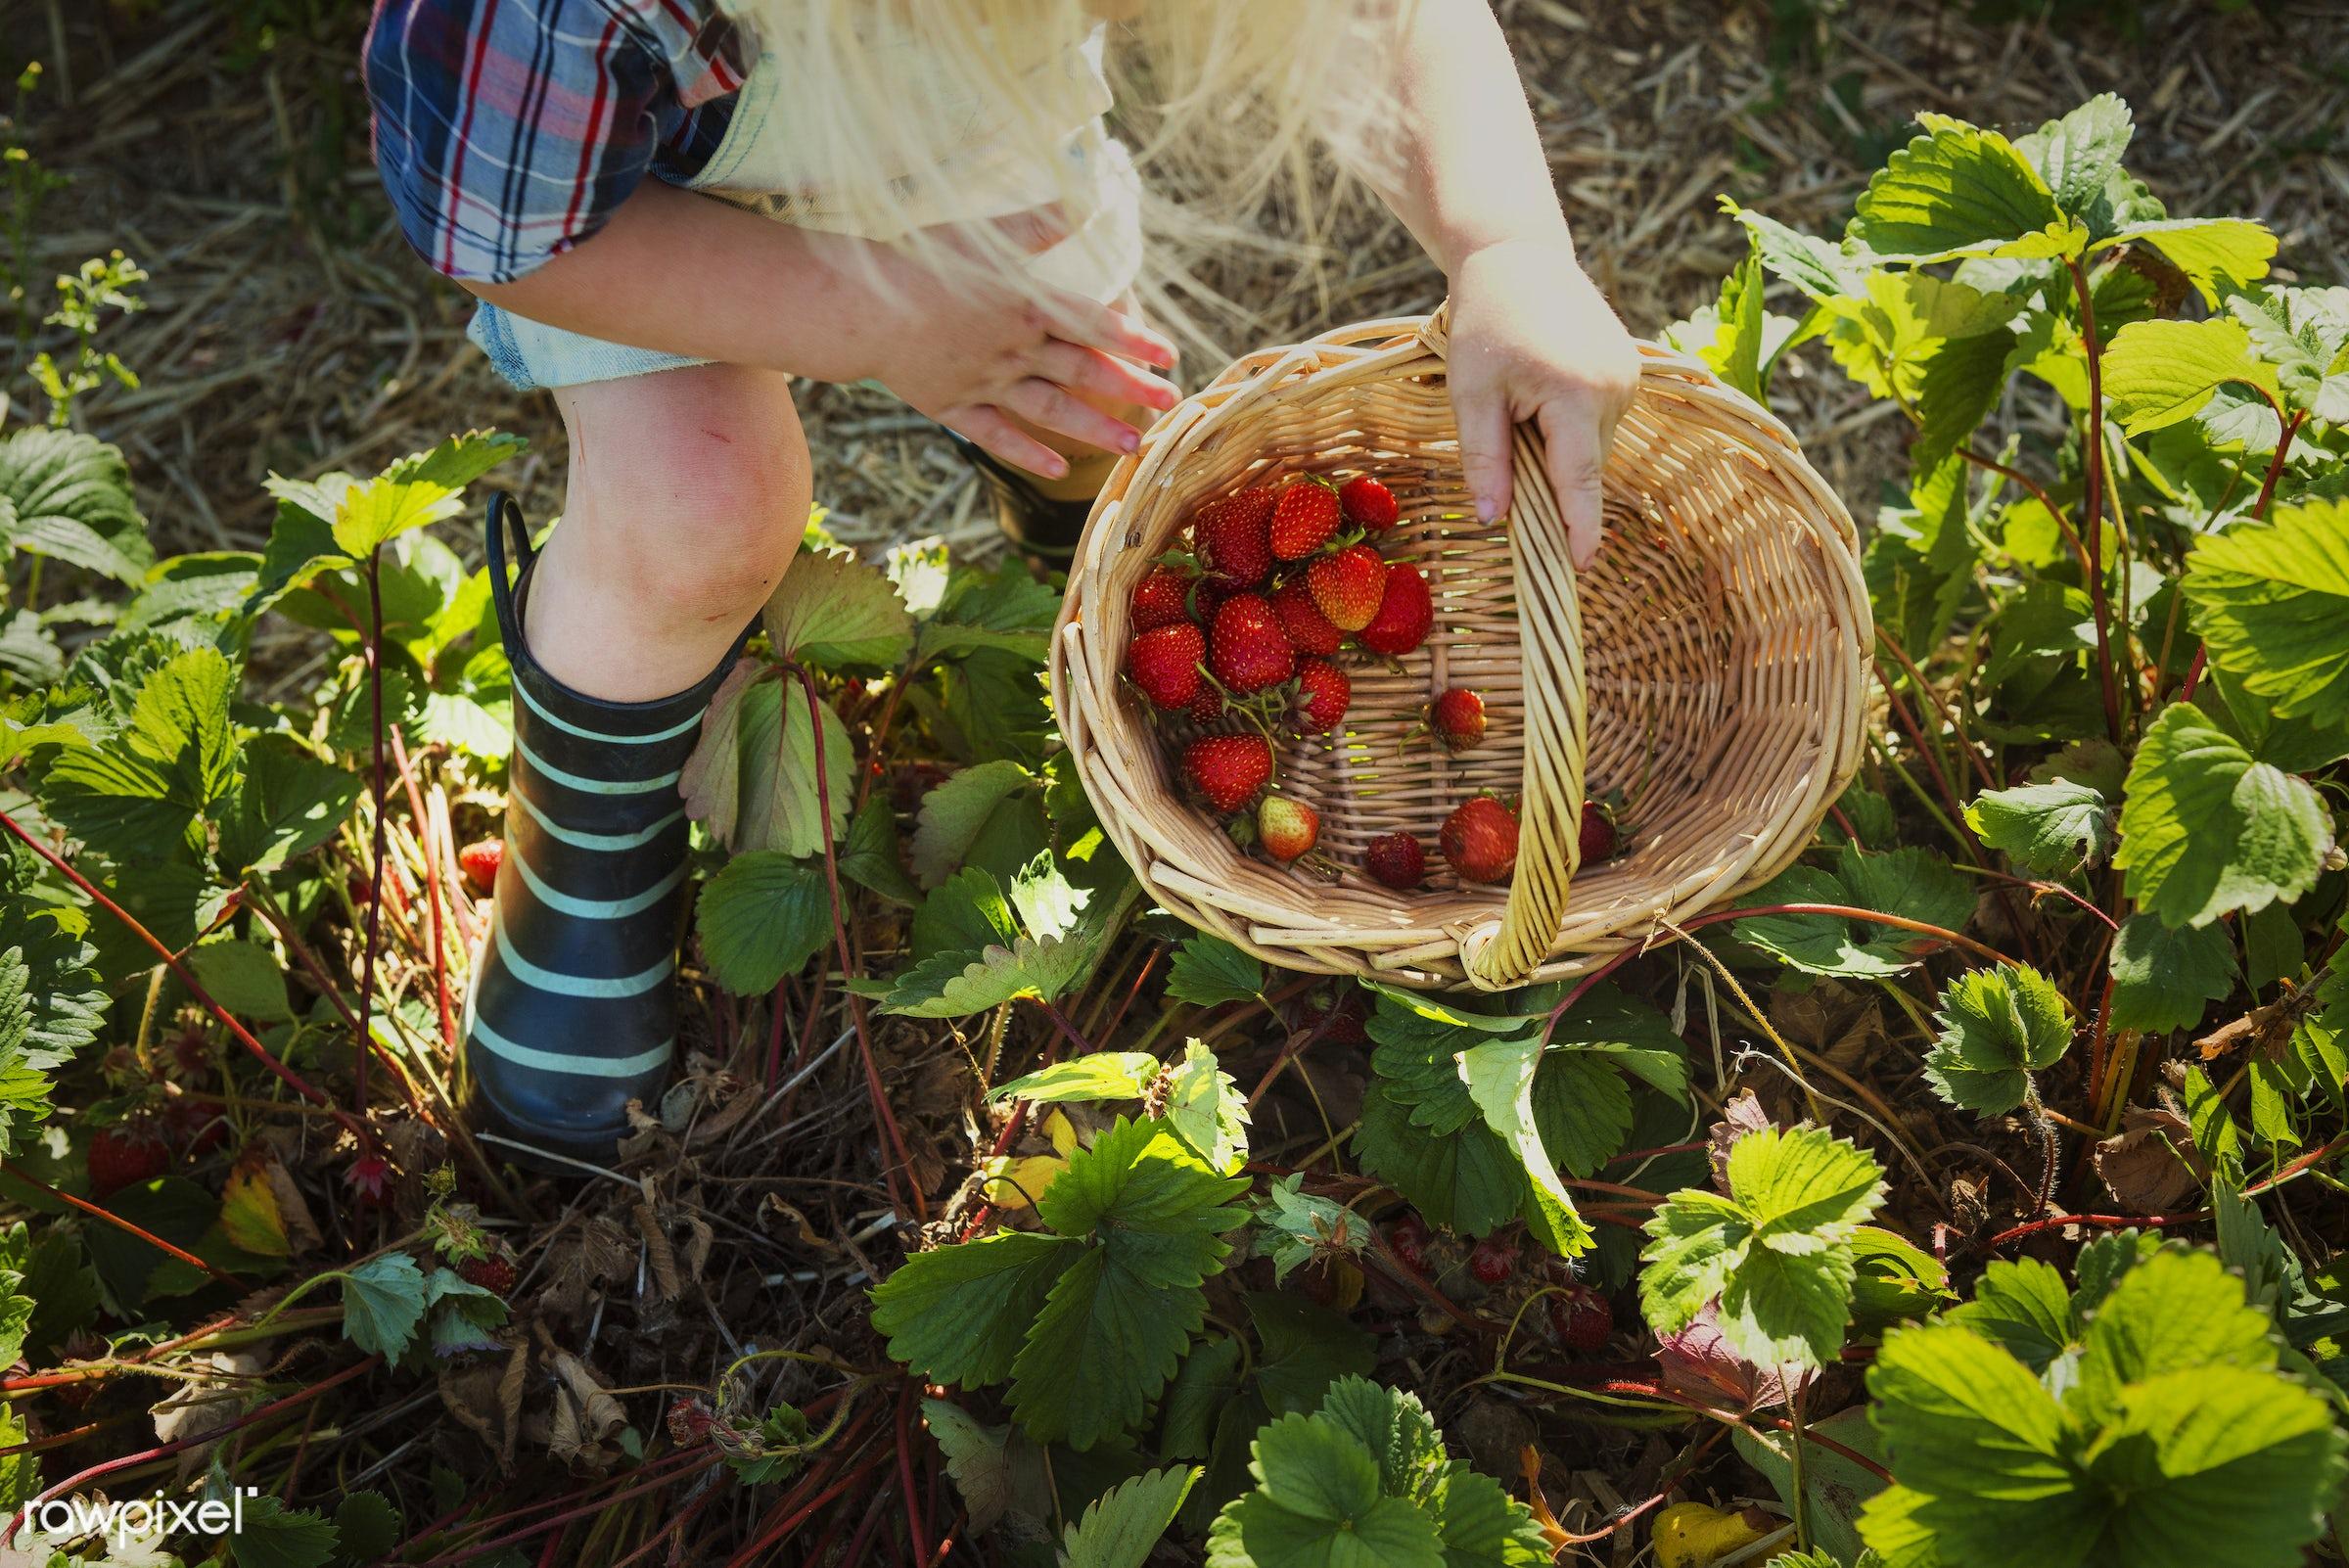 Kid in strawberry farm - alone, backyard, botany, boy, caucasian, countryside, cultivate, field, fresh, fruit, garden,...